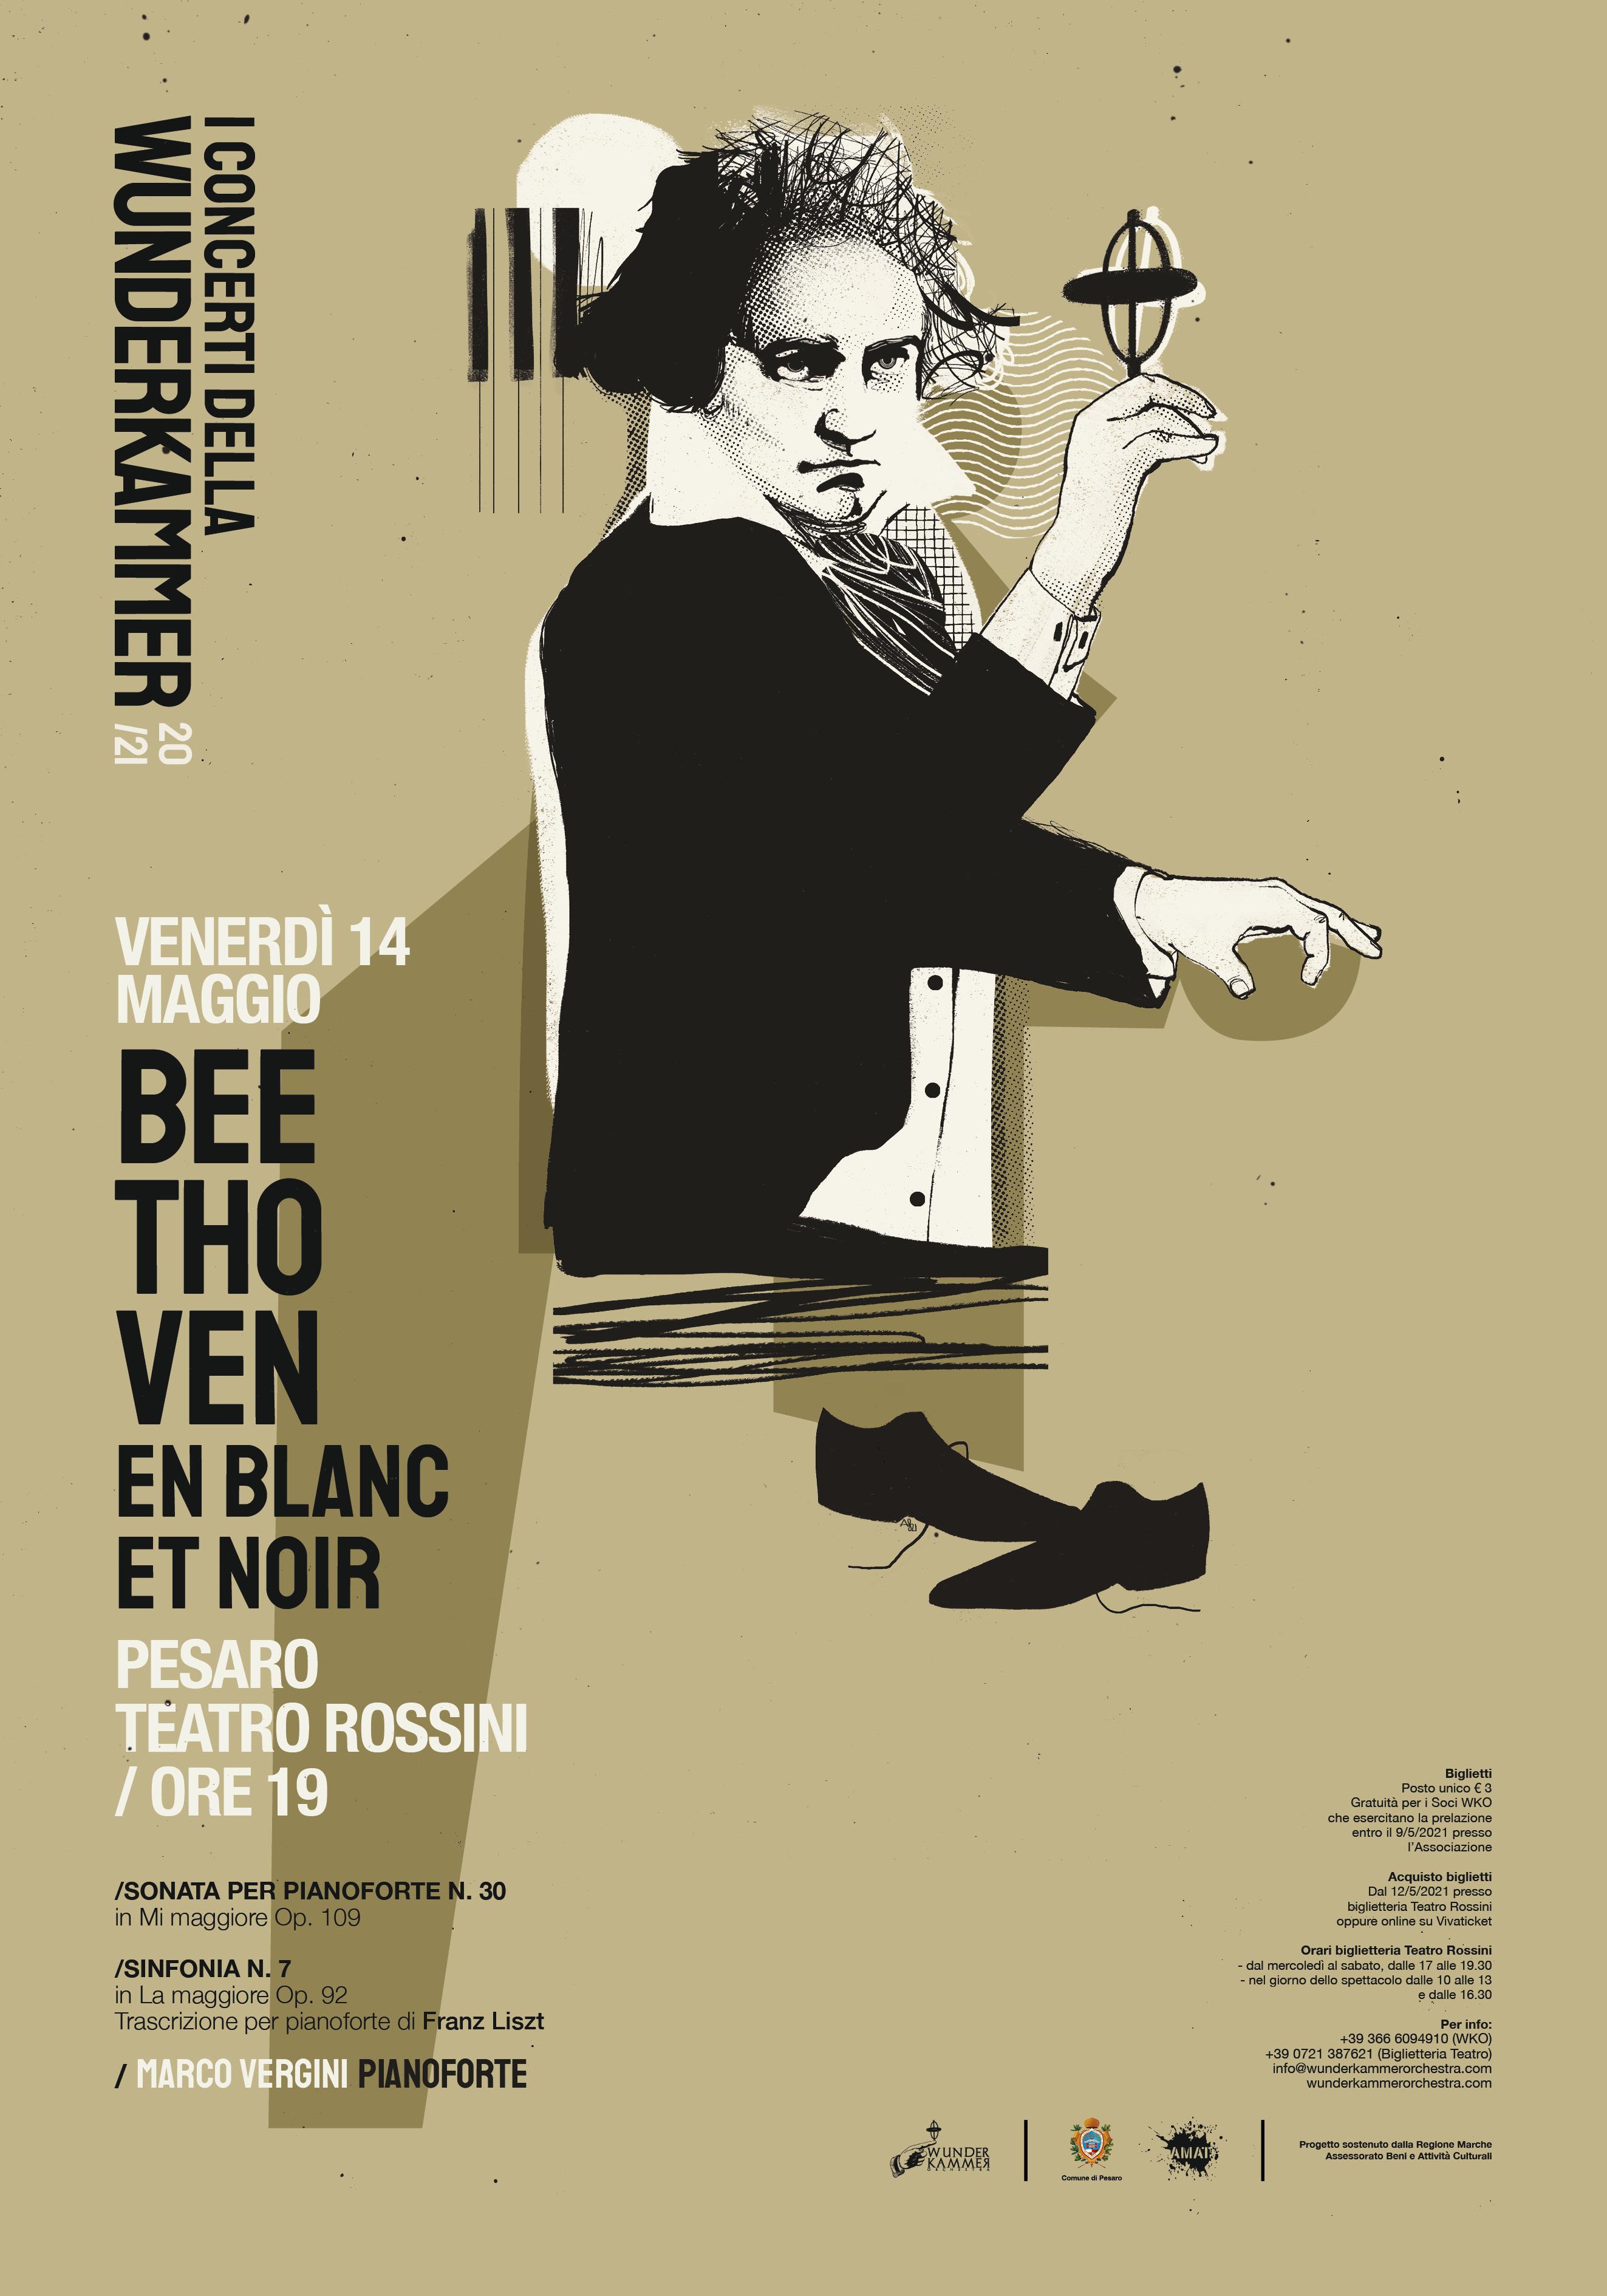 WKO Beethoven en blanc et noir locandina